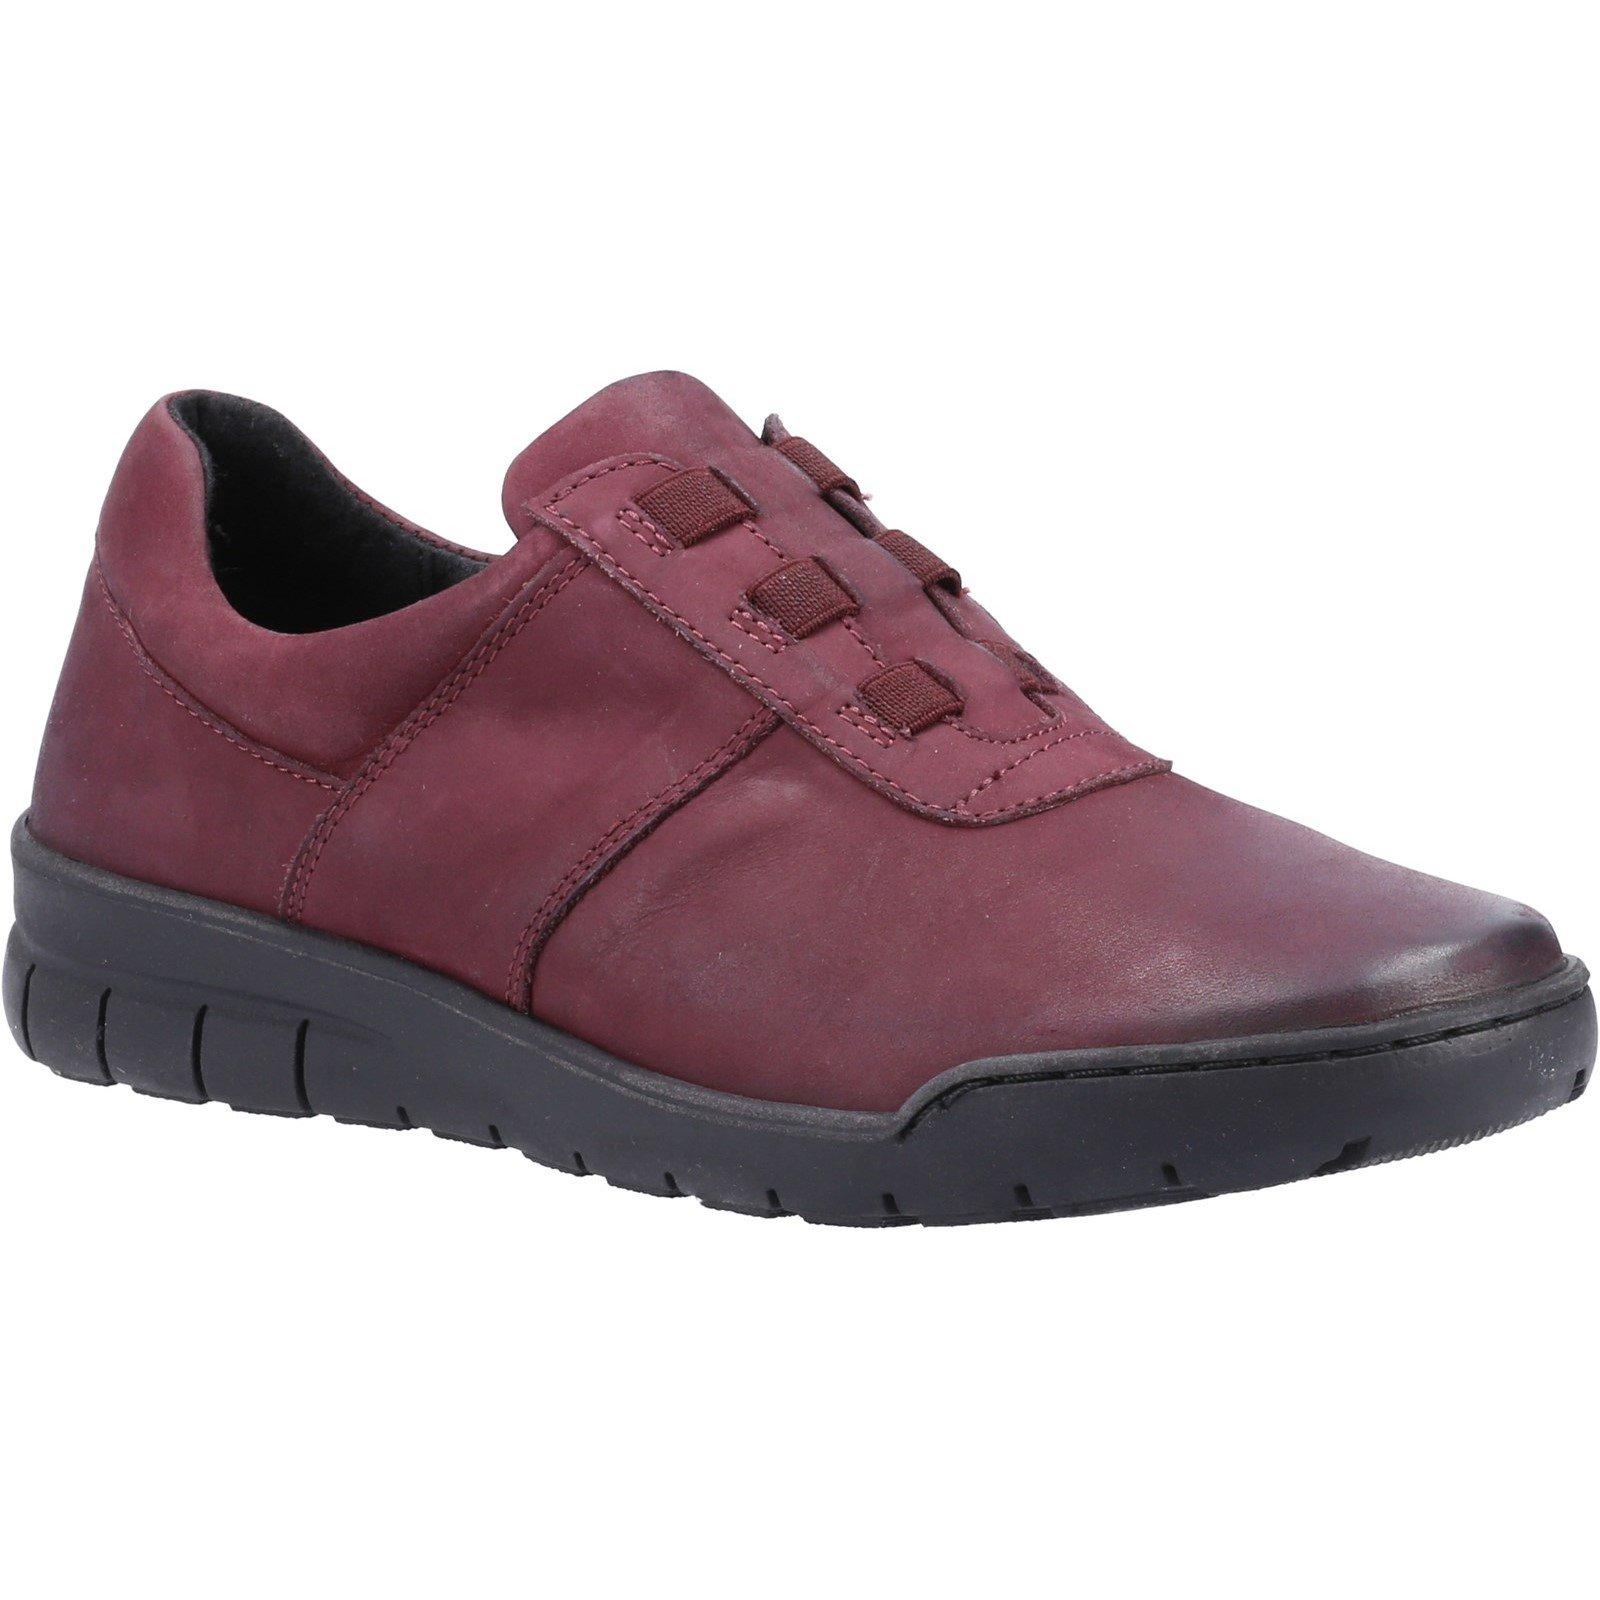 Fleet & Foster Women's Cristianos Slip On Shoe Various Colours 33015 - Bordo 3